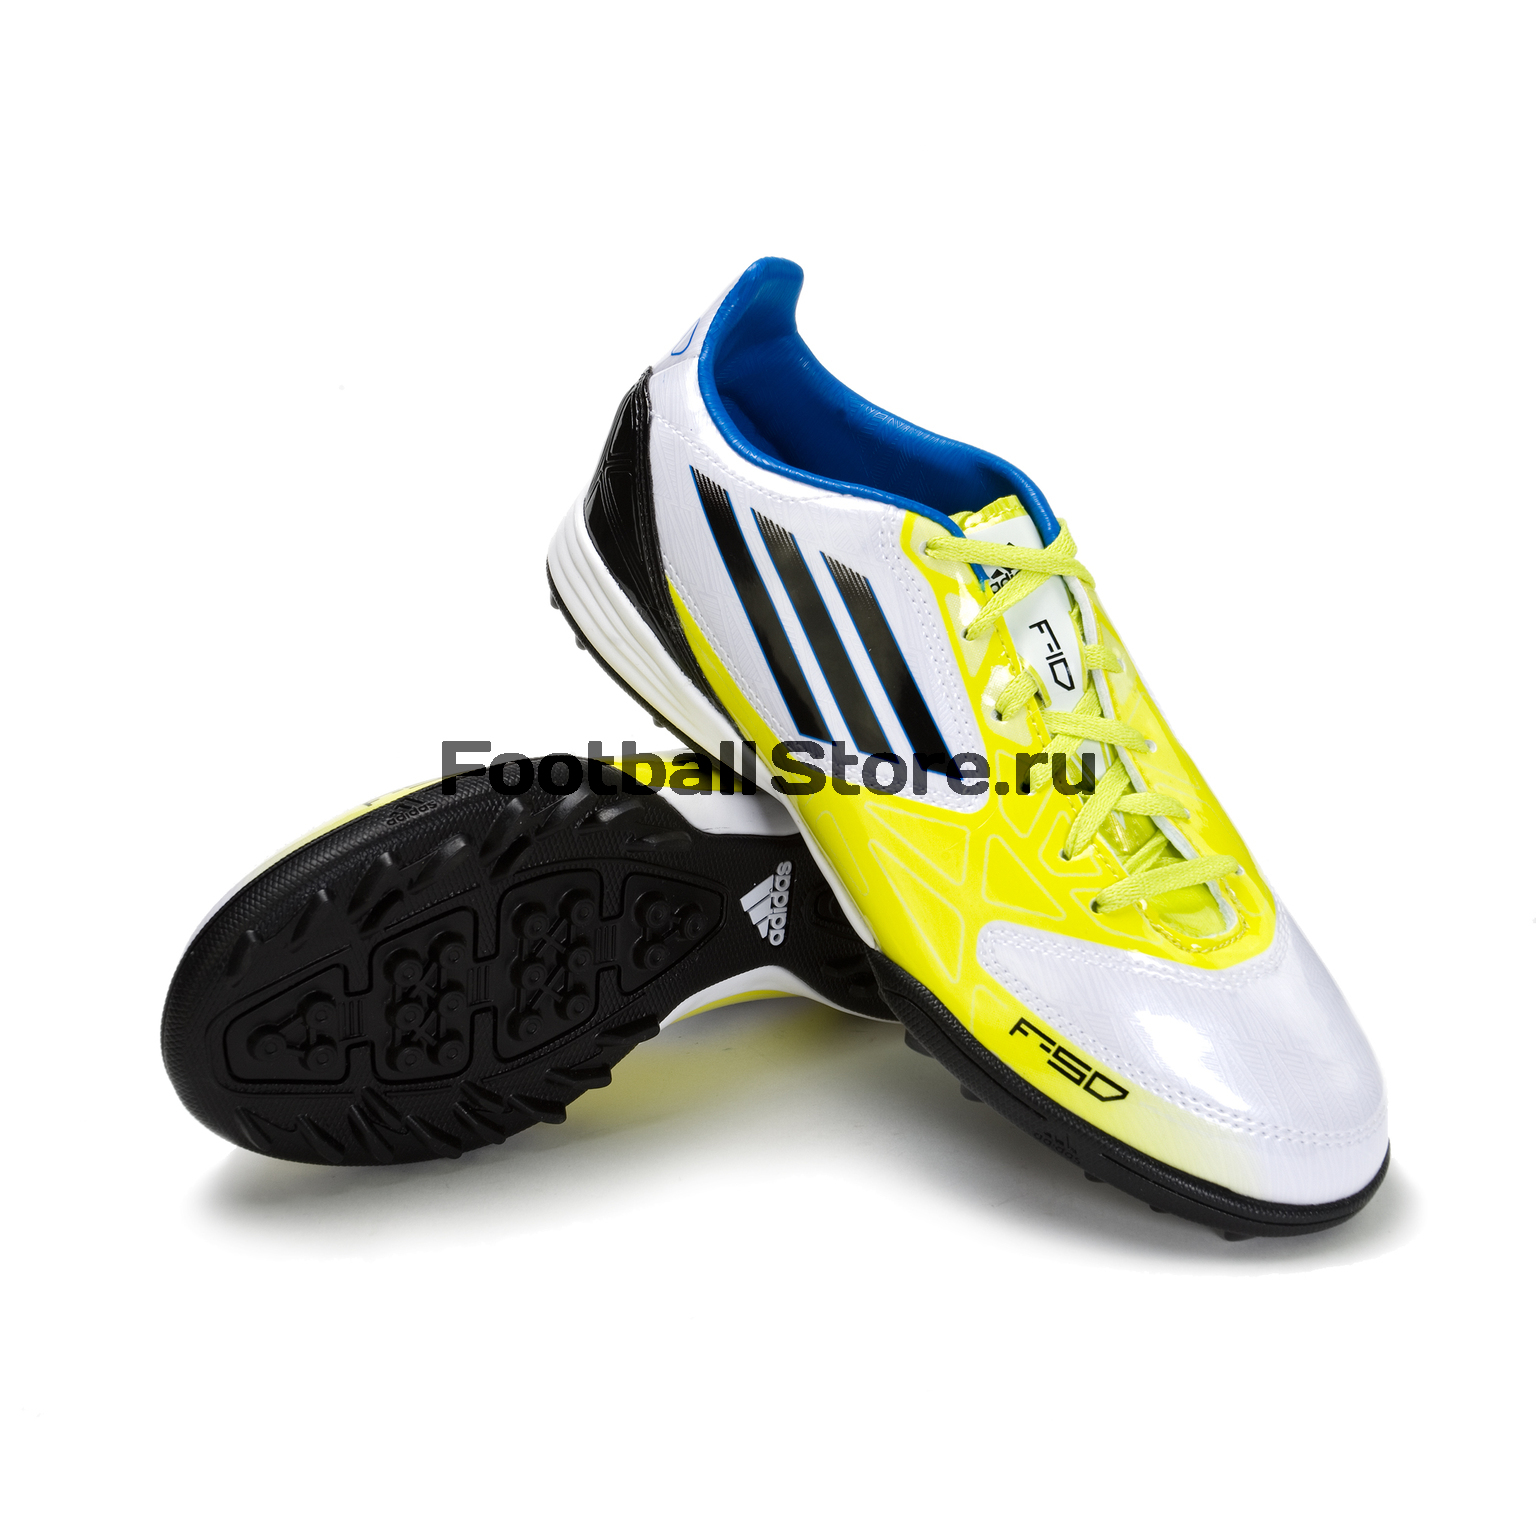 f1133bc7 ... Детские бутсы · Adidas; Шиповки Adidas f10 trx tf j. Скидка